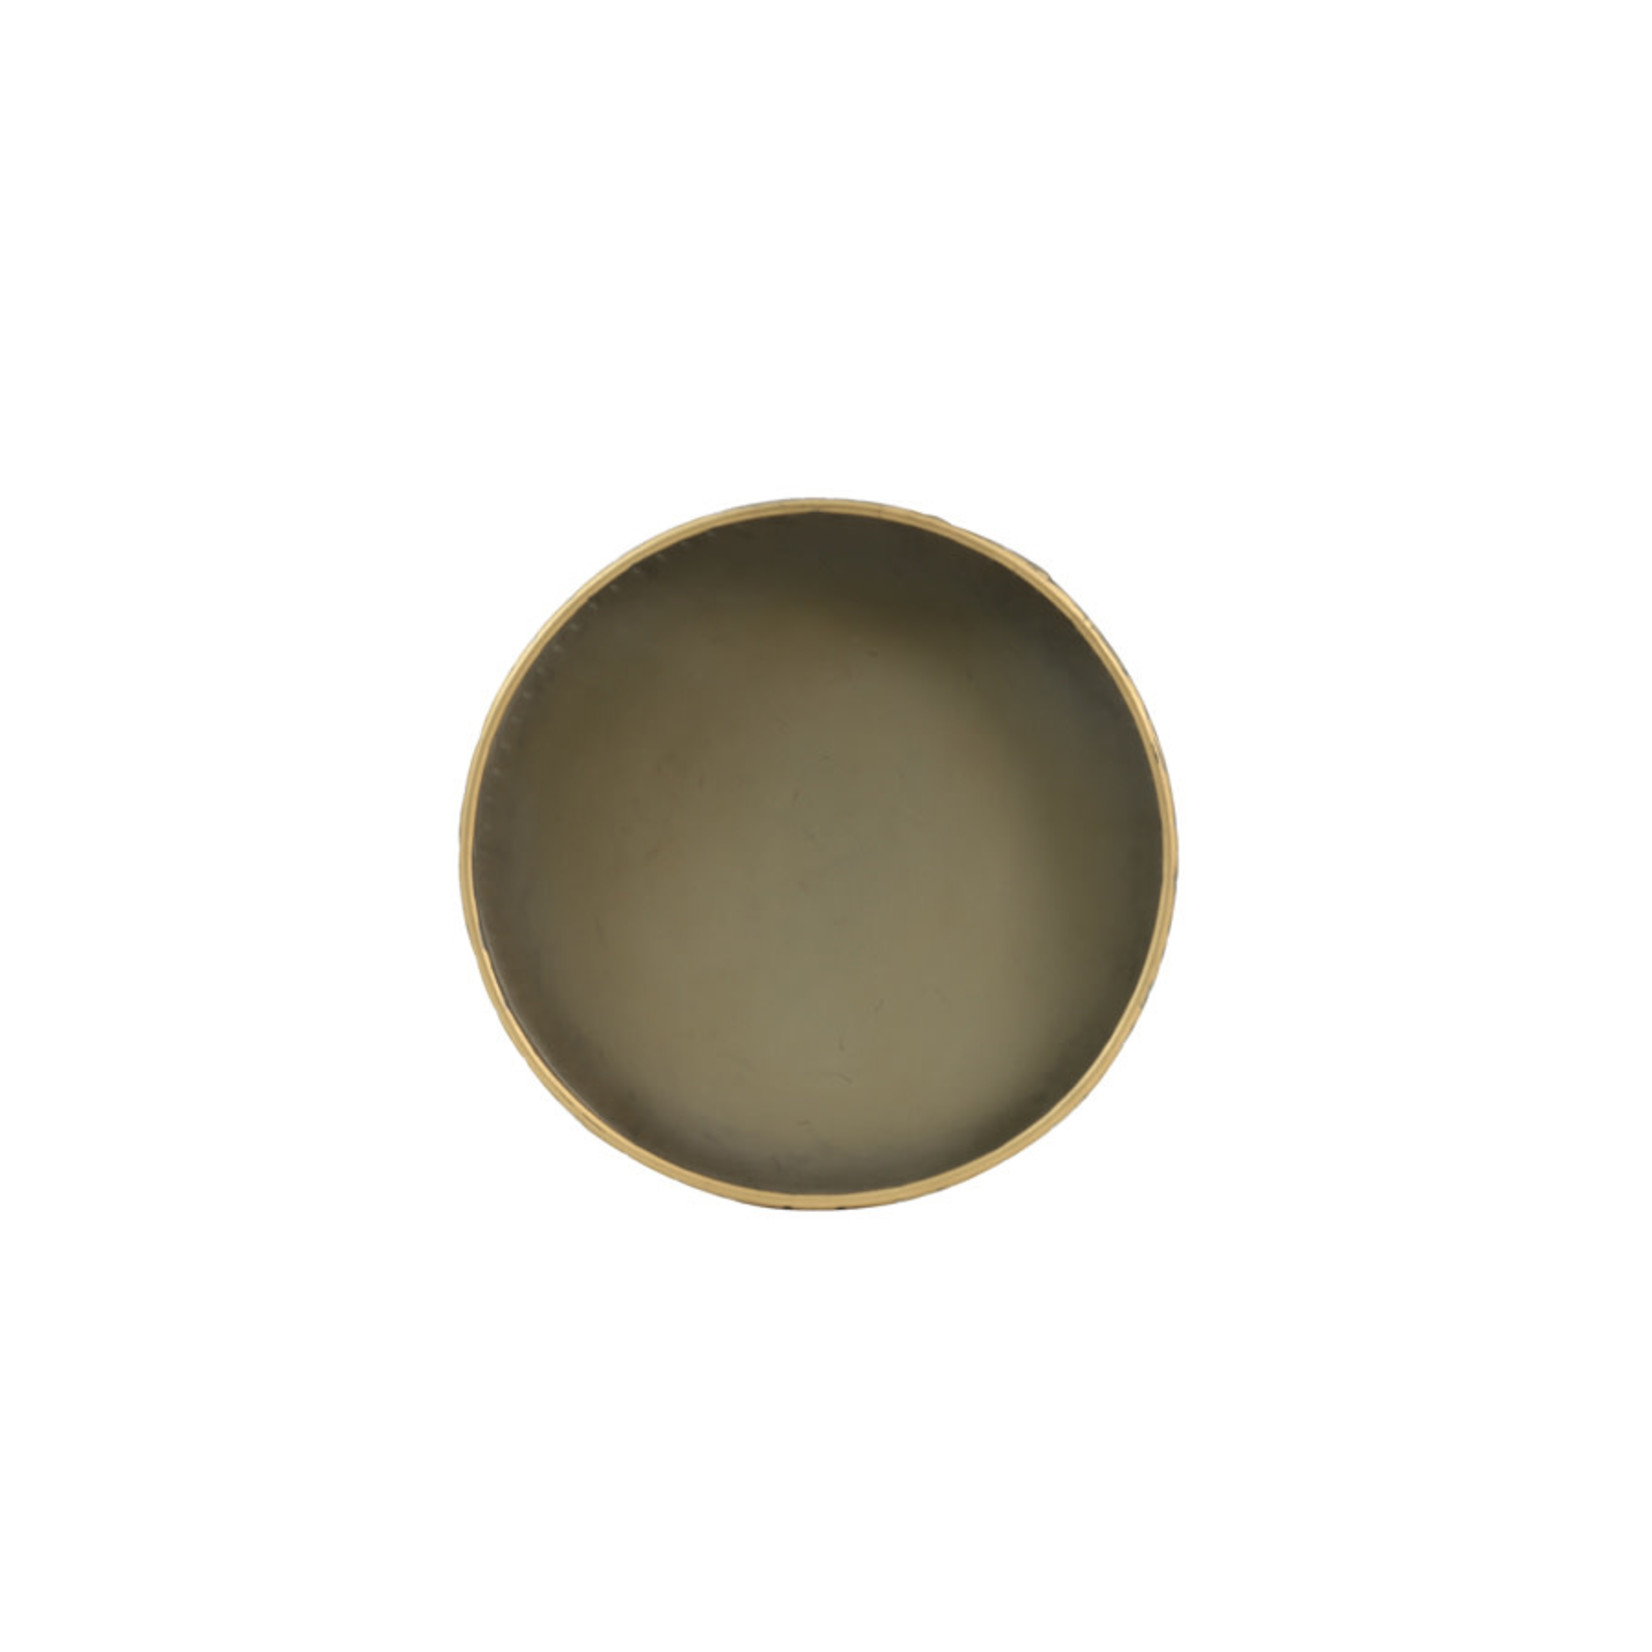 Light & Living Dienblad Ø30x6,5 cm STAVO tin brons